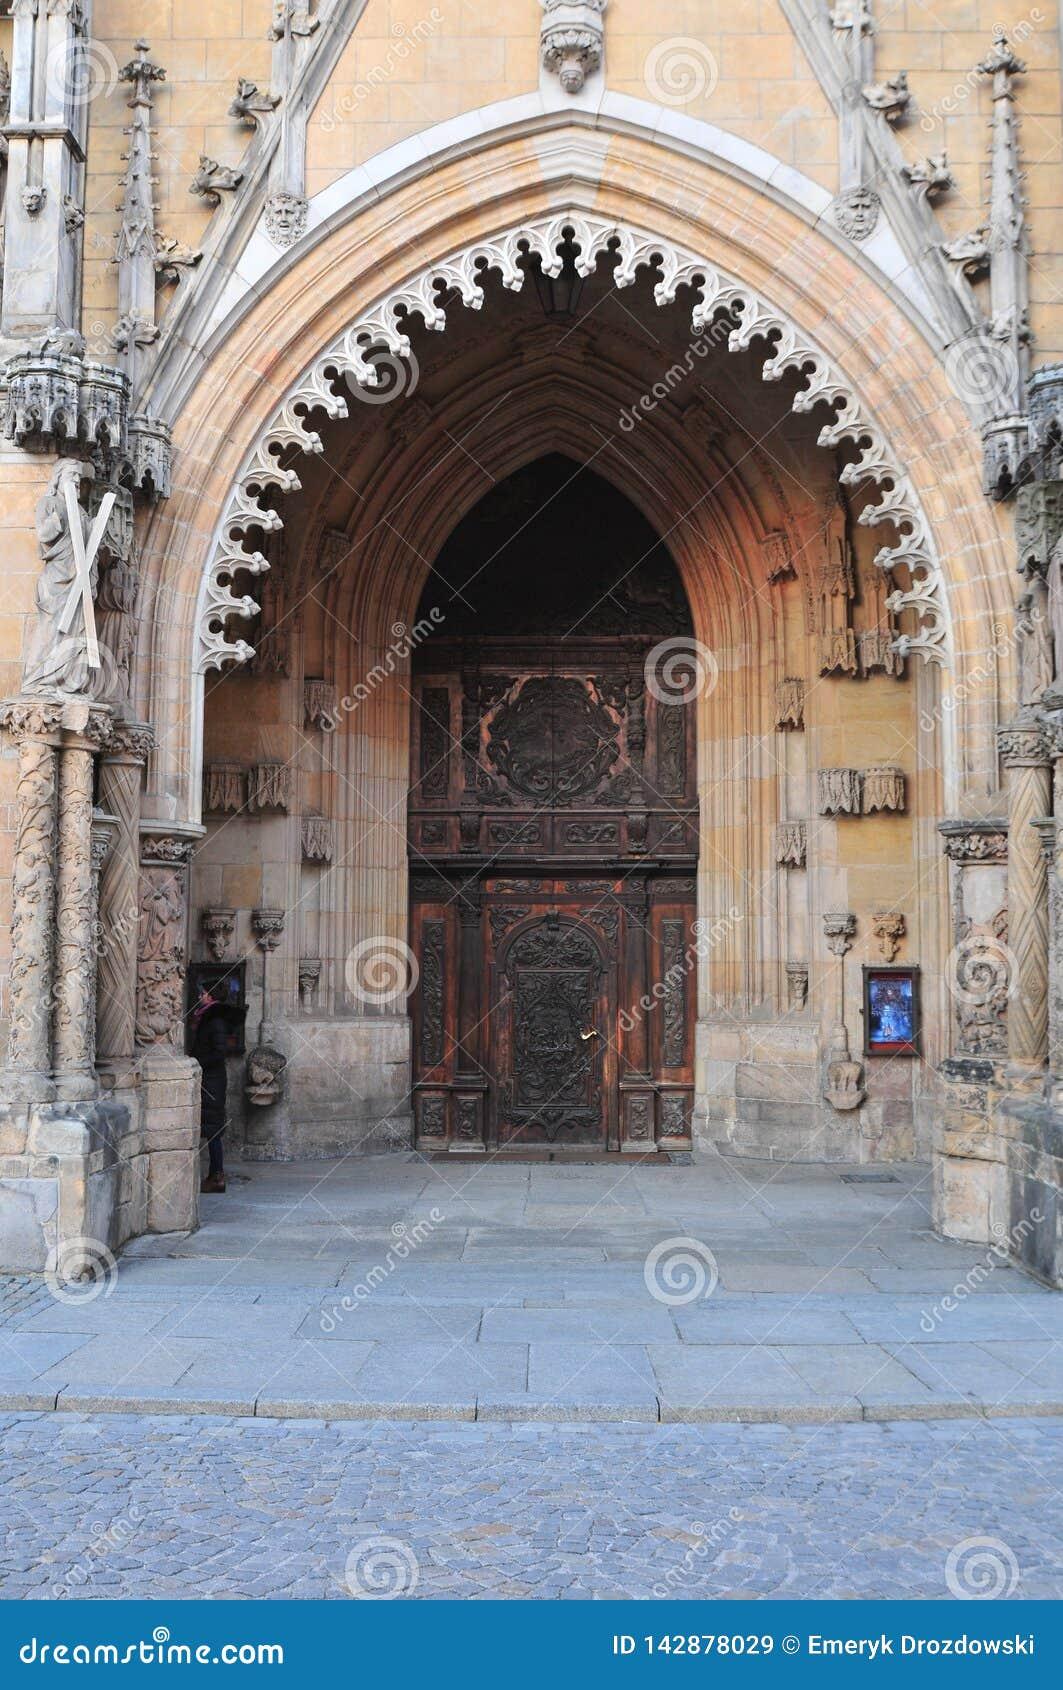 Entrada principal à catedral de St John Baptist Archikatedra Sw Jana Chrzciciela